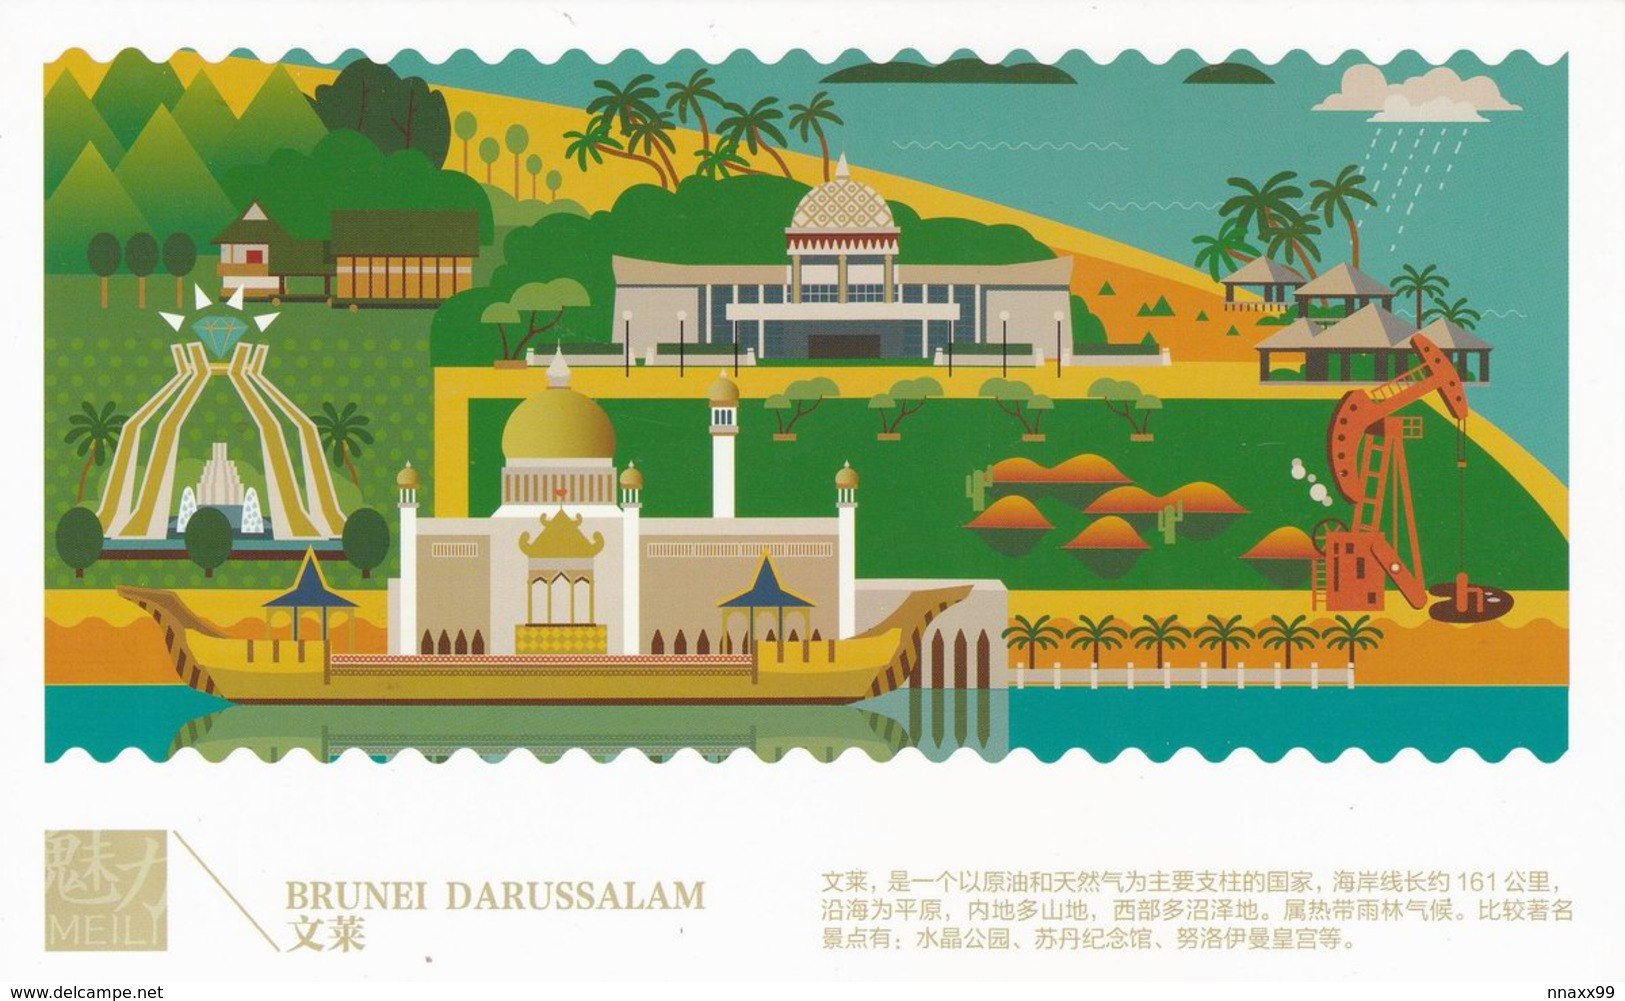 Brunei - Jerudong Park, Omar Ali Saifuddin Mosque, Royal Regalia Building, Oil Extraction Machine, Etc., China's Pc - Brunei